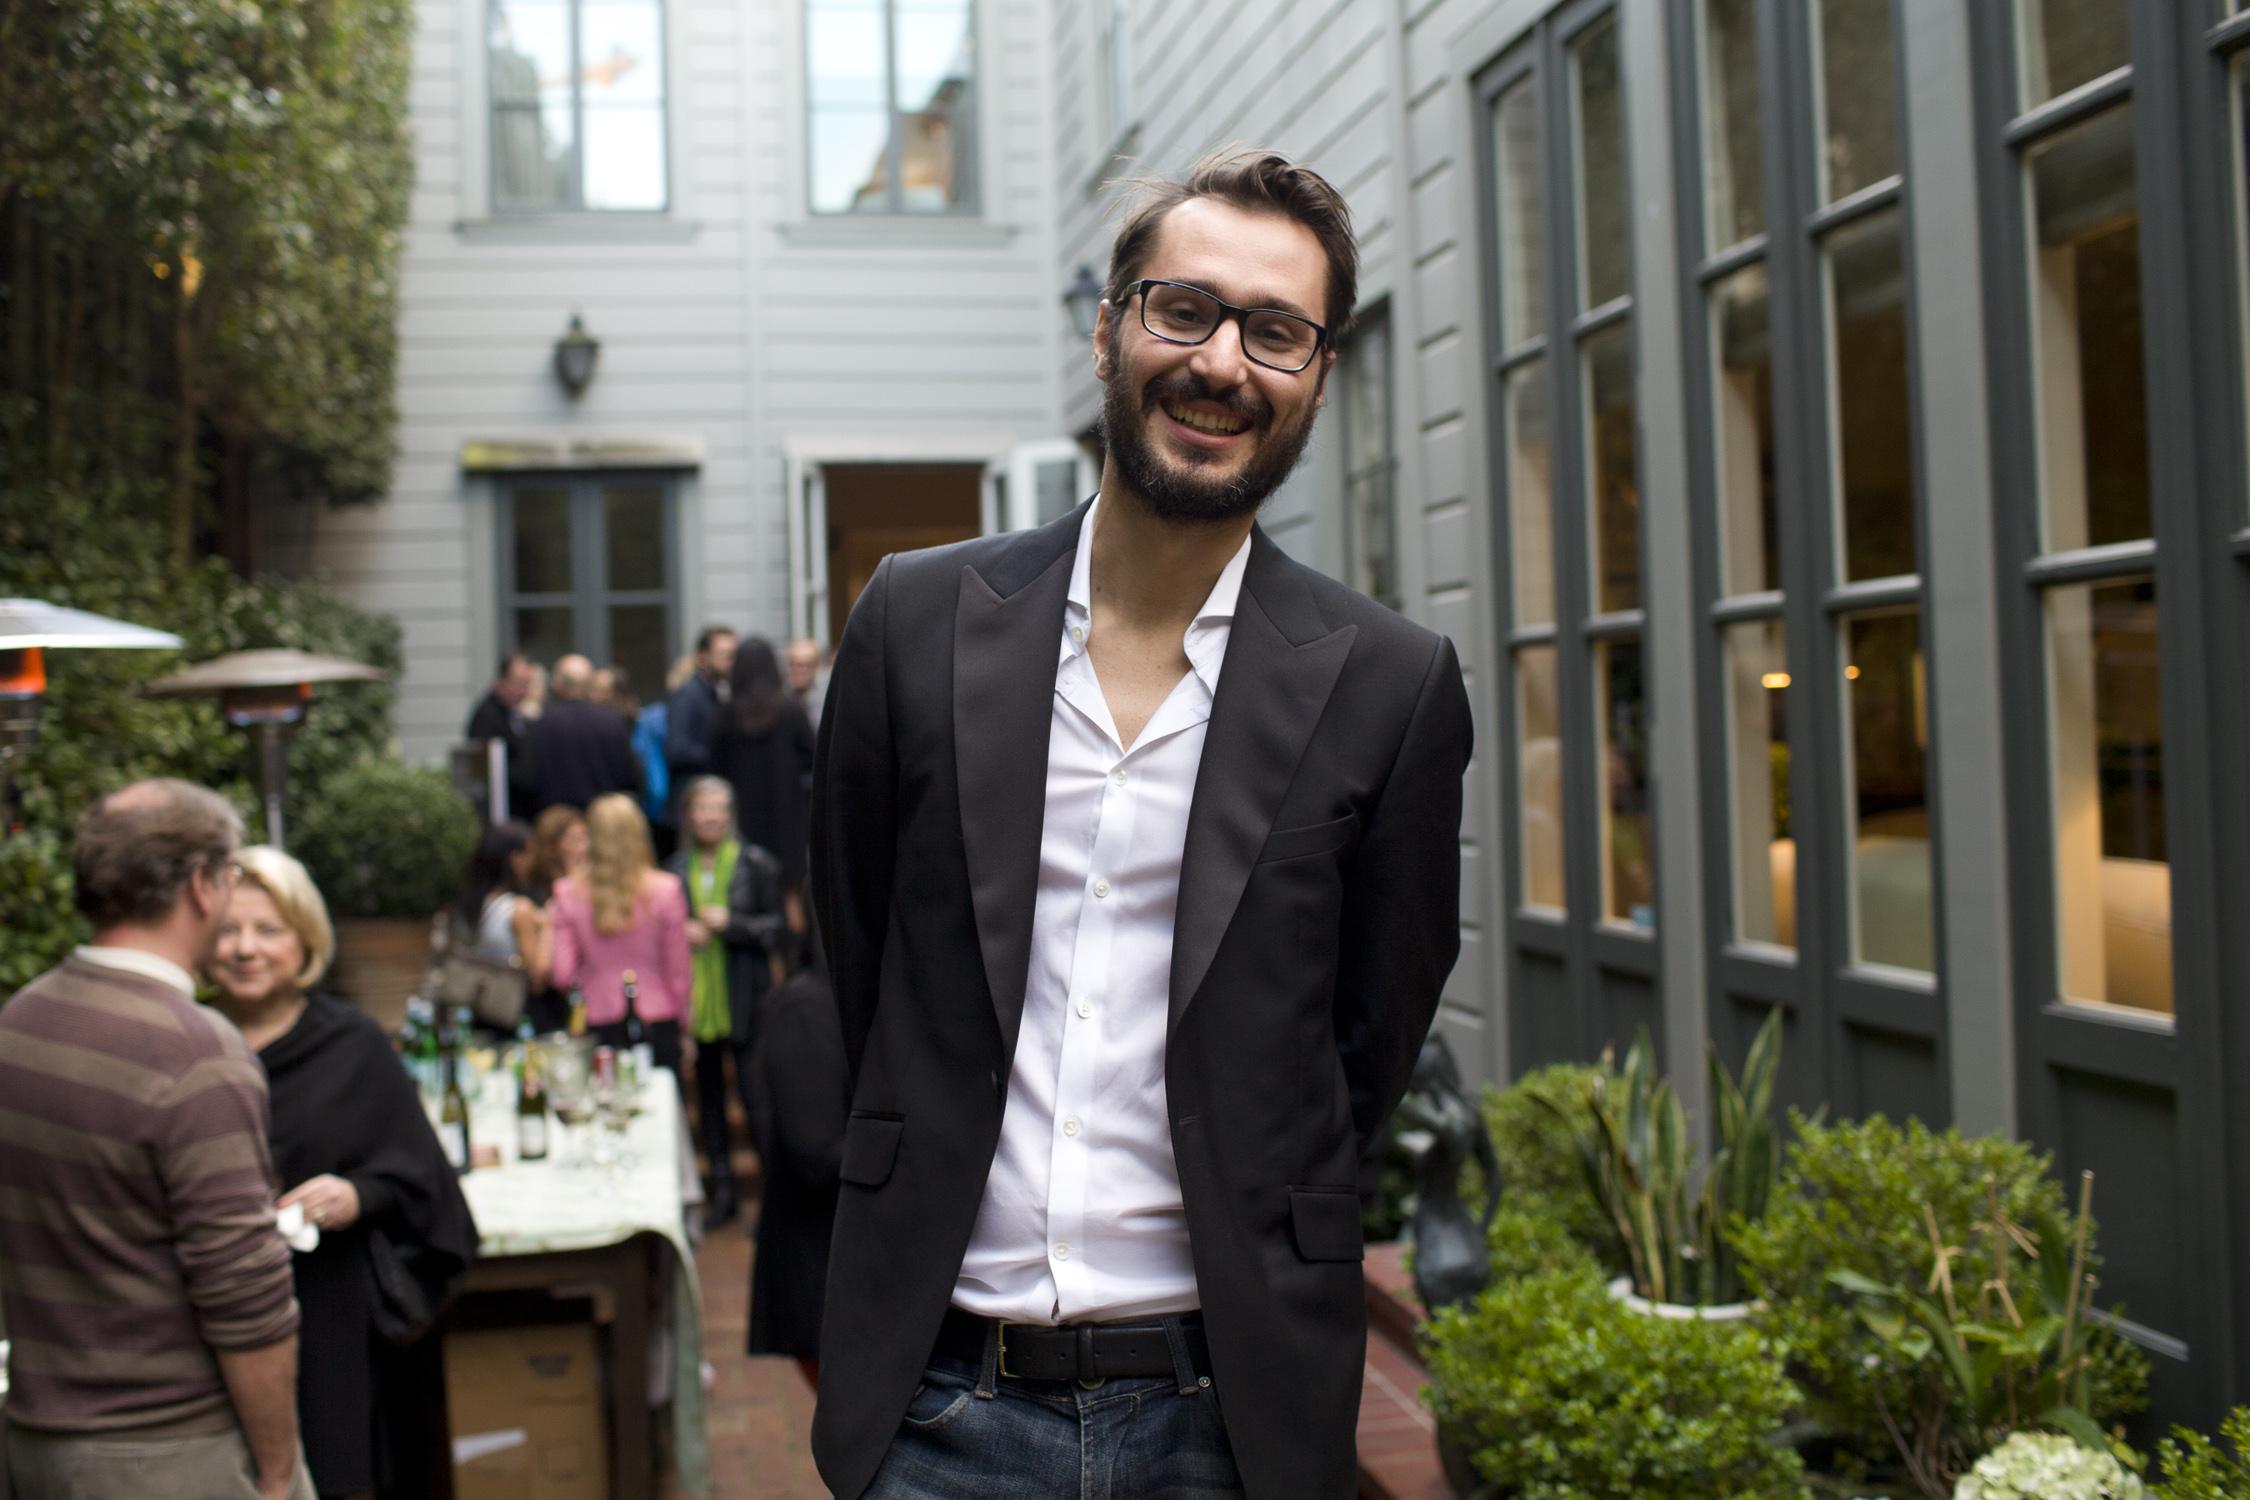 Filmmaker Matteo Bini